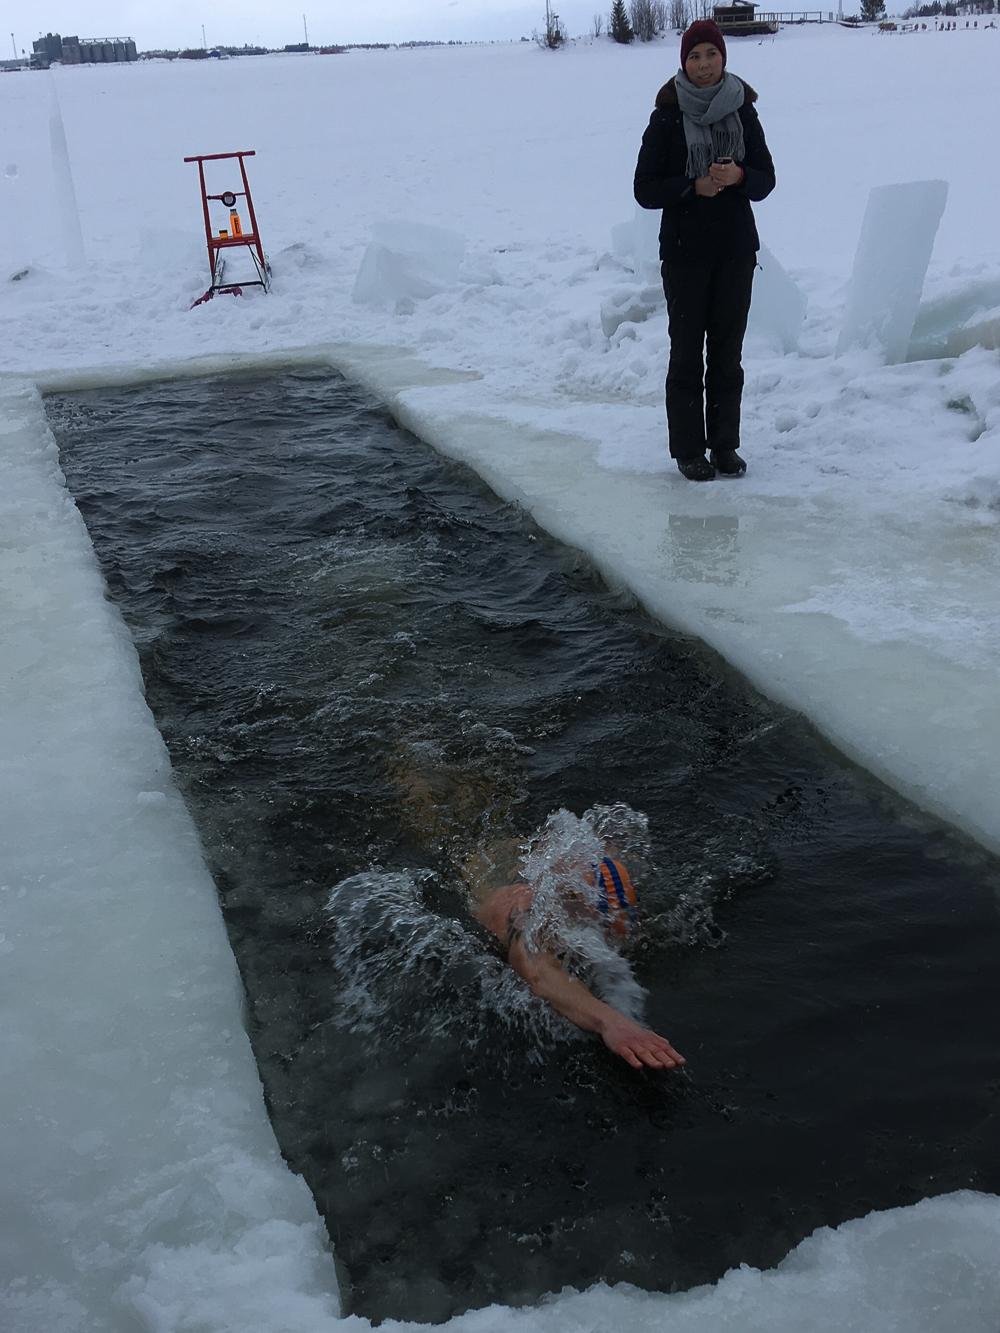 Vinterbada i isvak (utan bastu) – Johanna Westberg